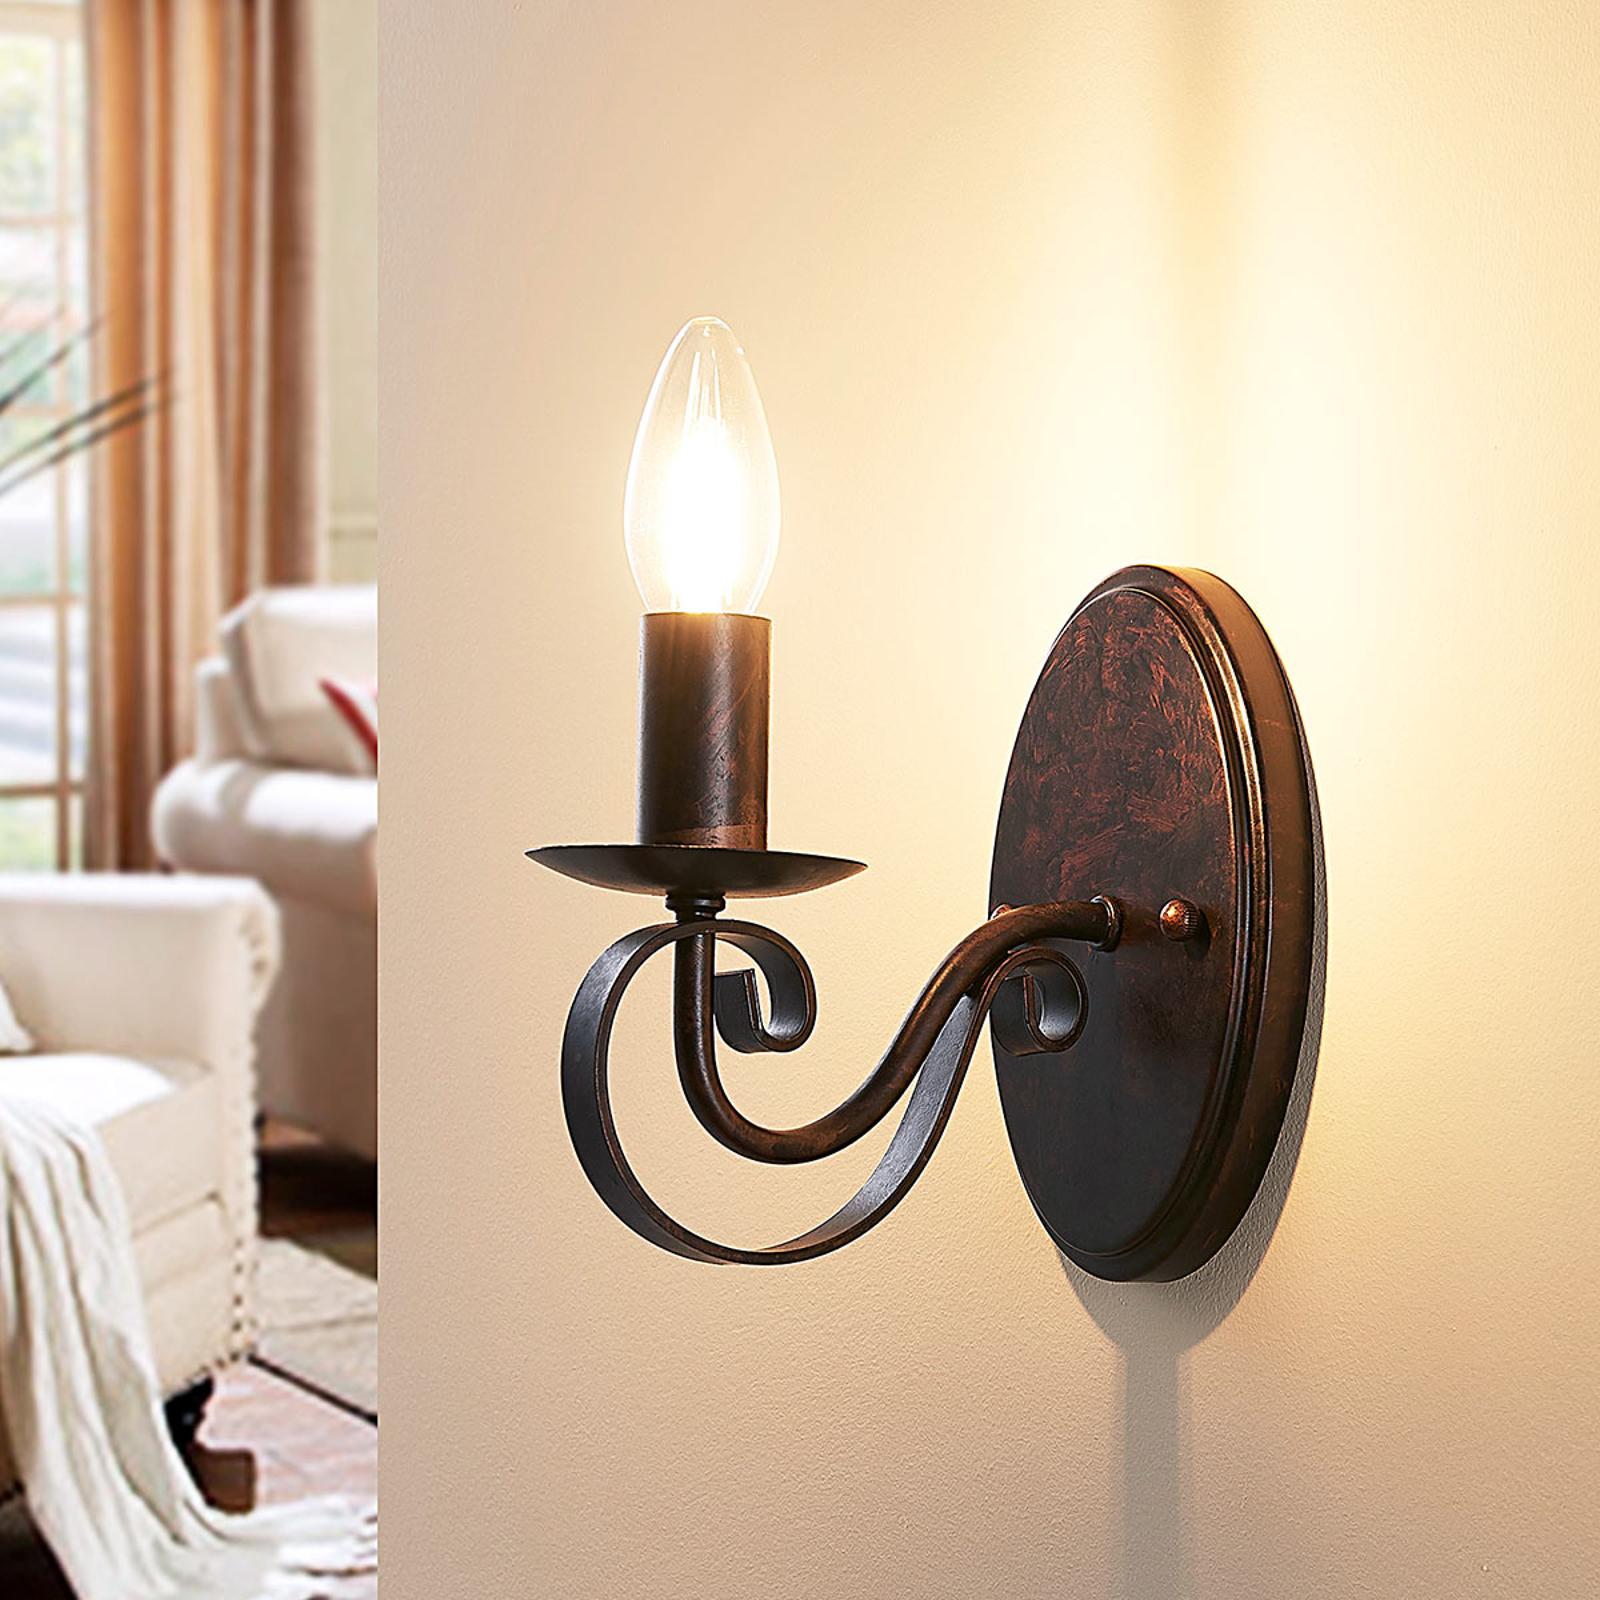 Caleb - roestkleurige wandlamp in landelijke stijl